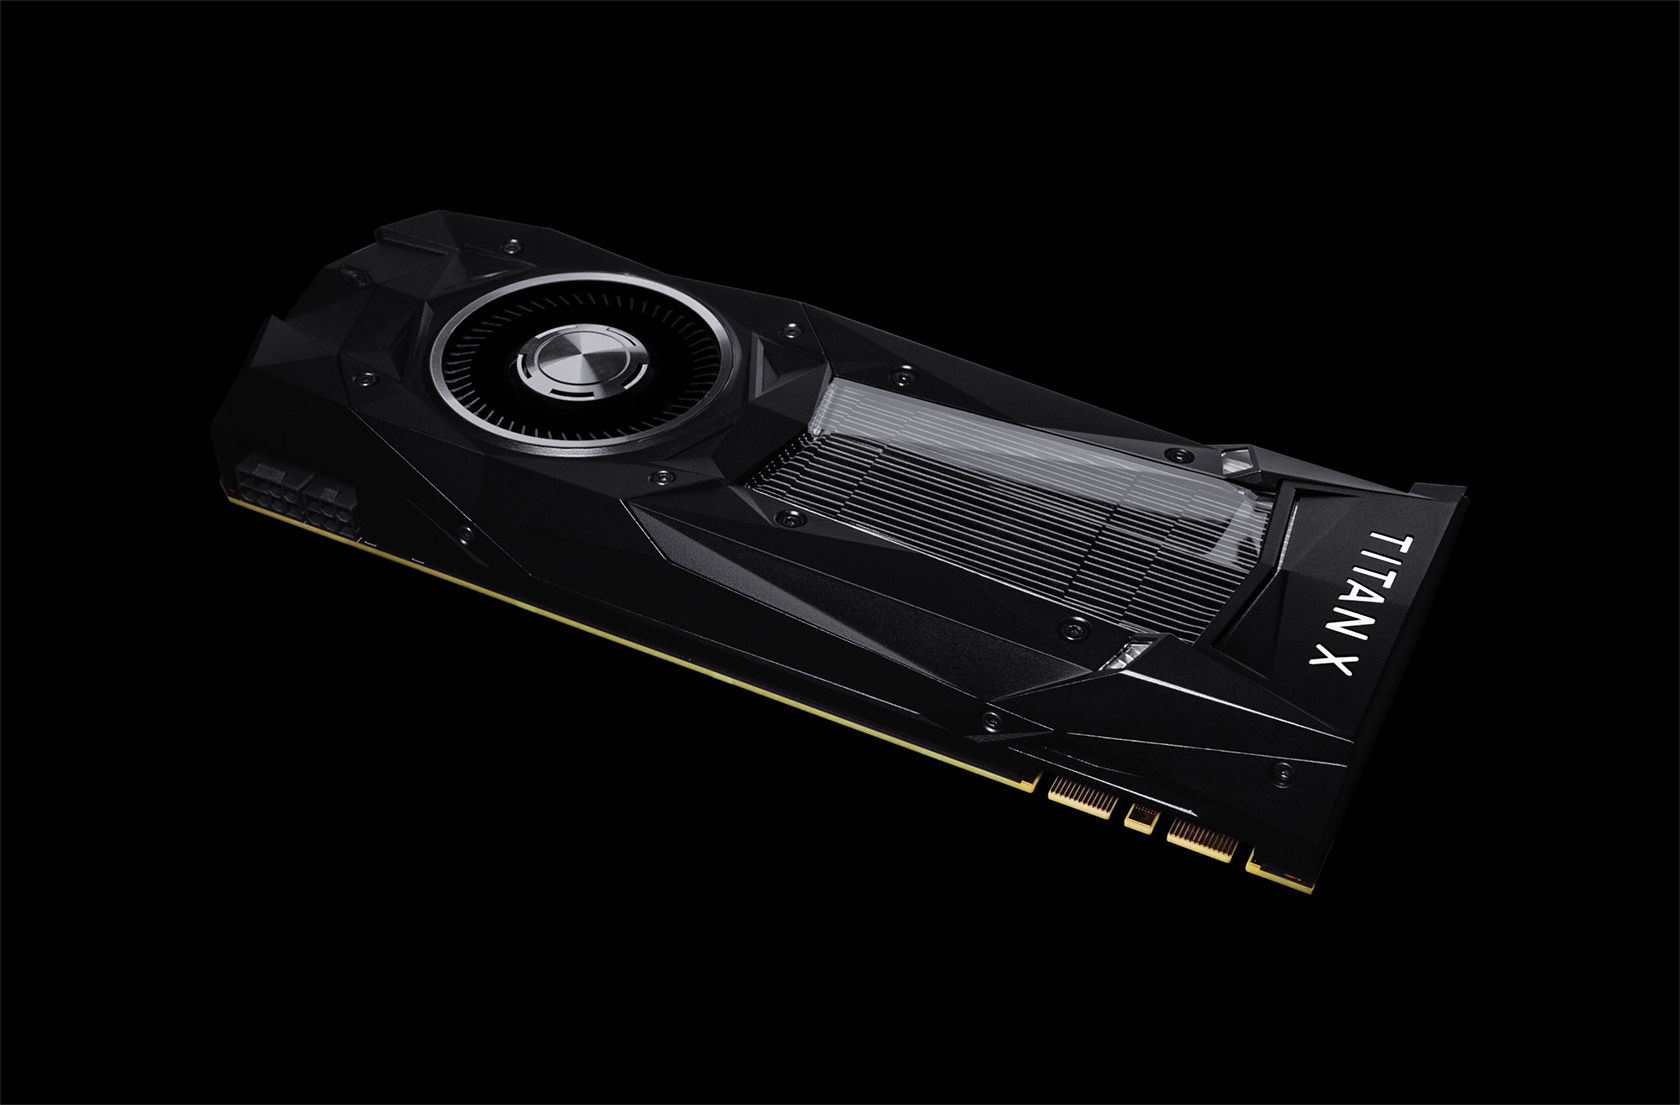 NVIDIA vuelve a lanzar otra bestia gráfica: la Titan Xp